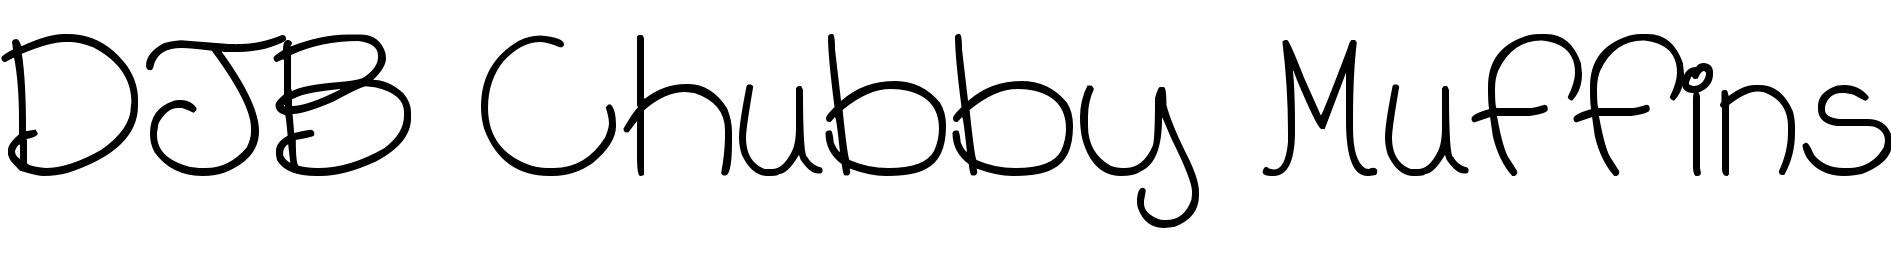 DJB Chubby Muffins